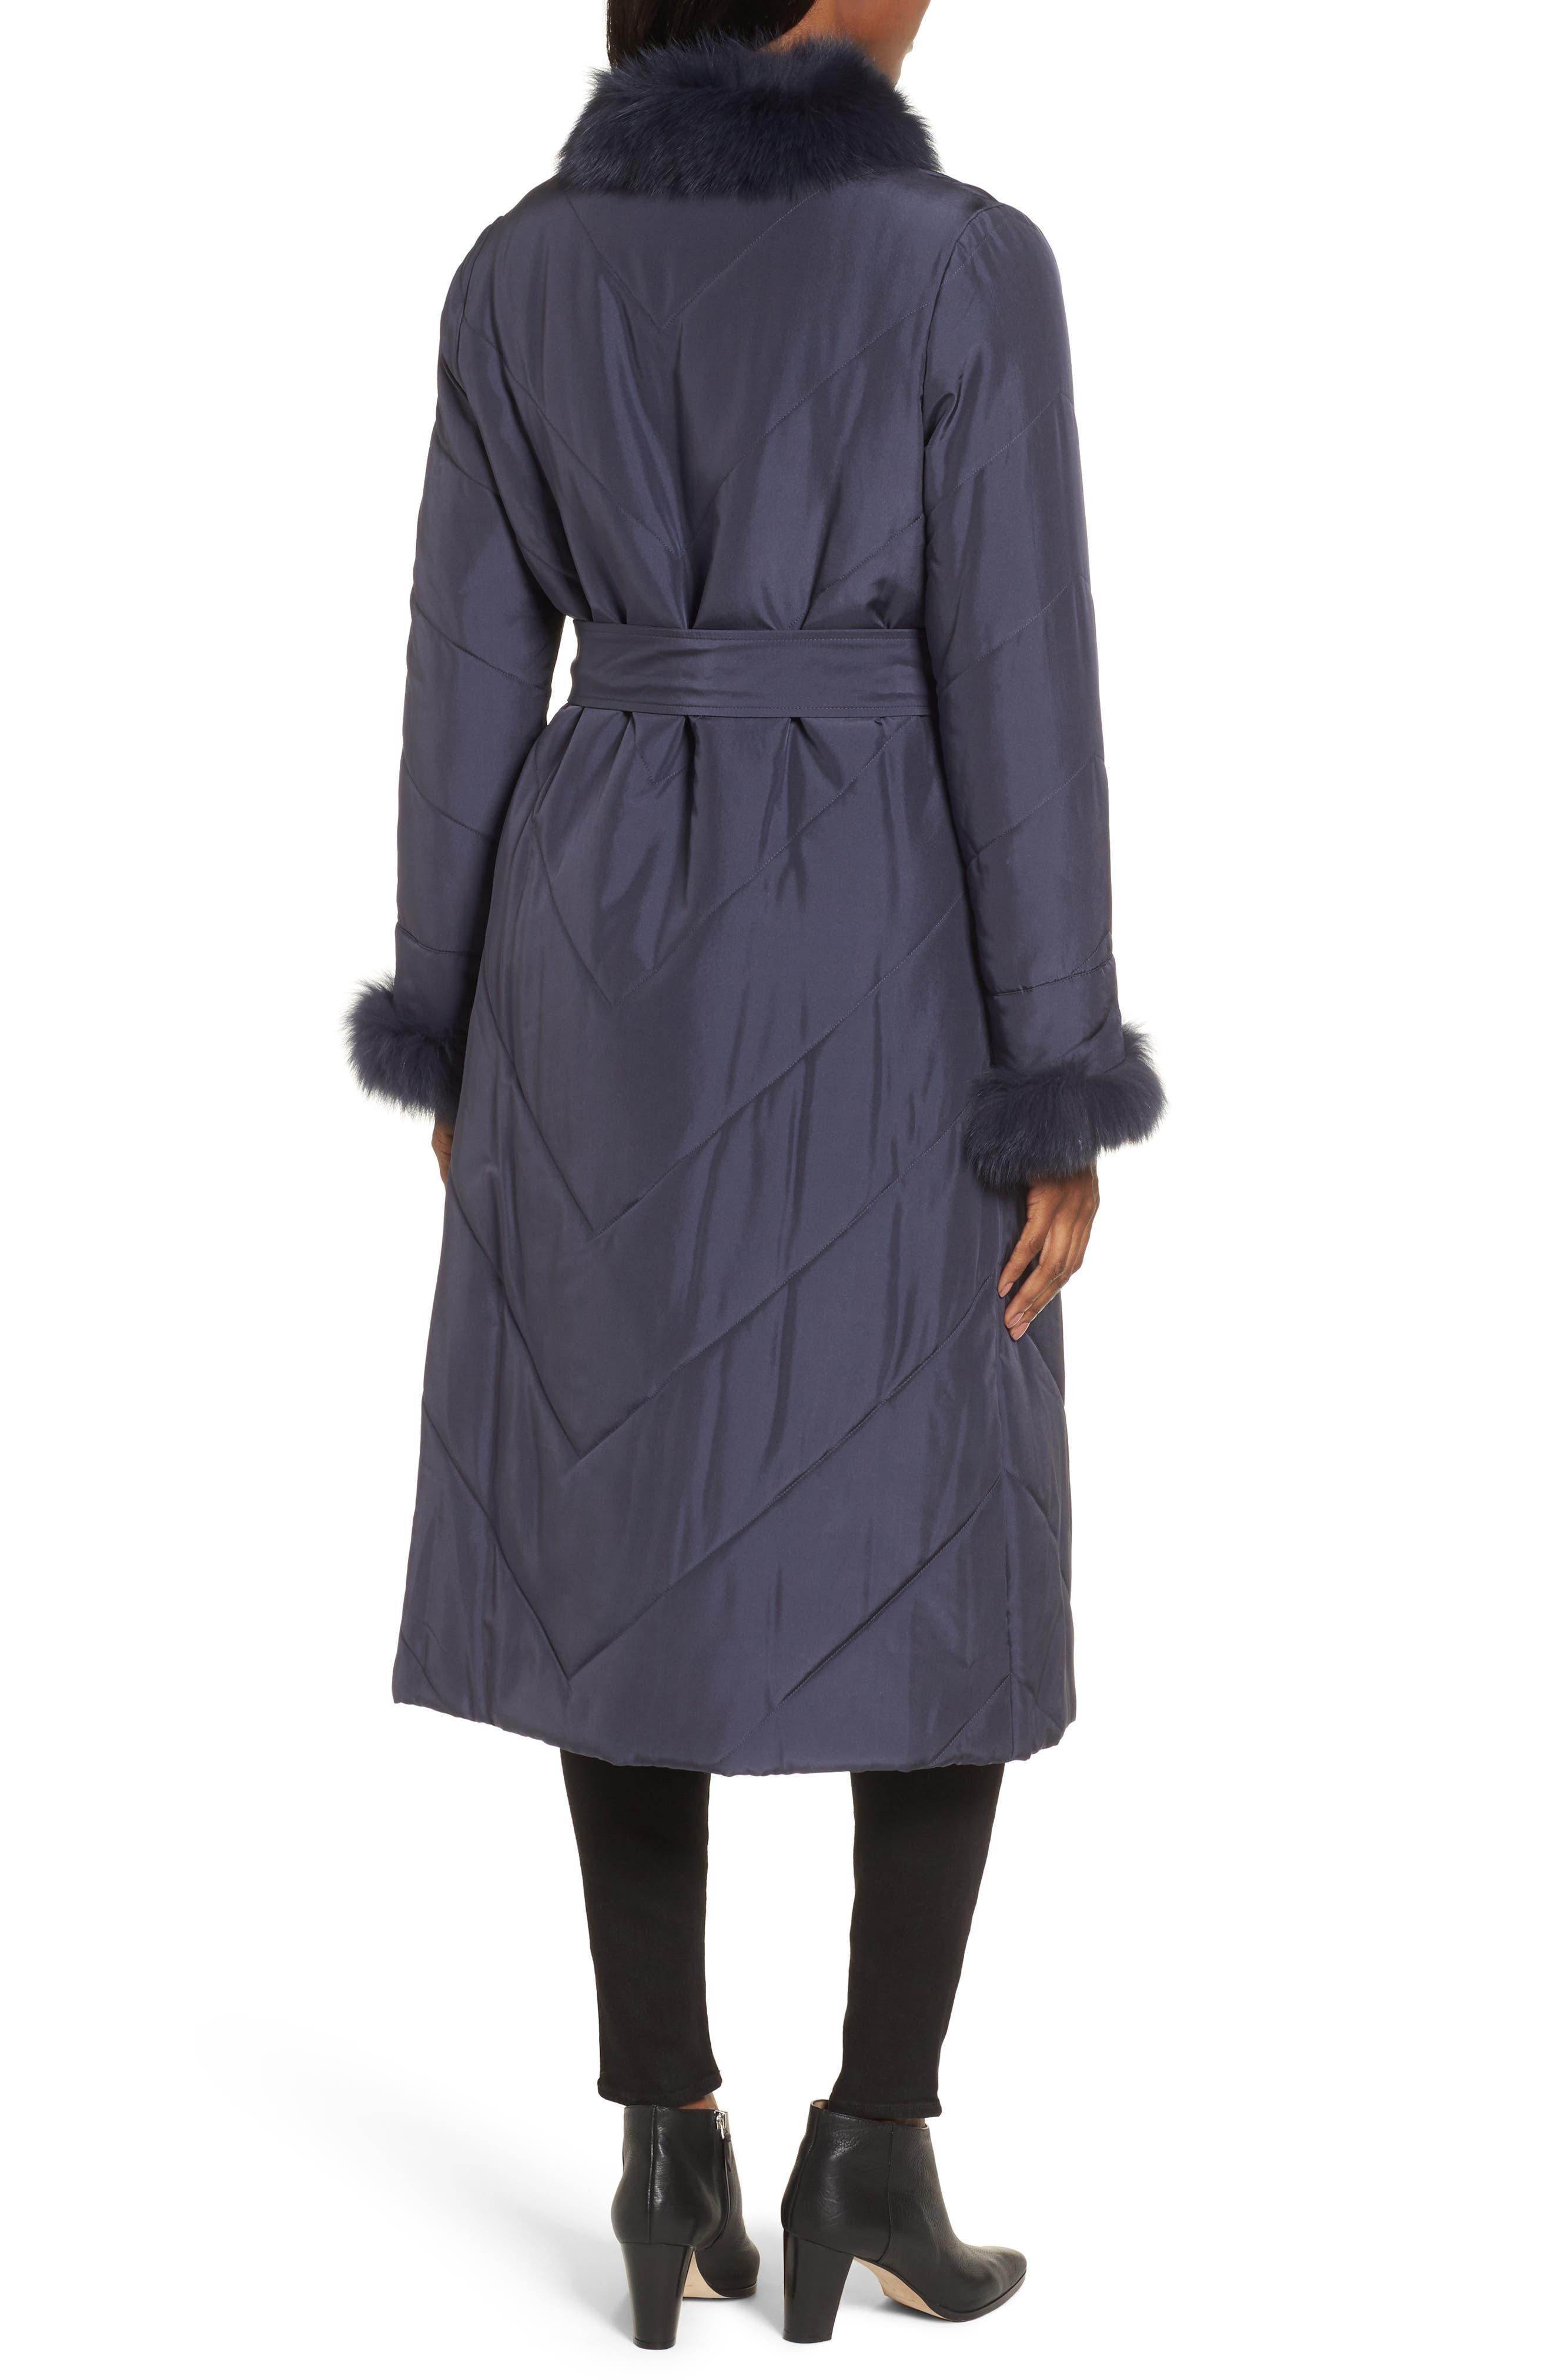 Couture Packable Silk Coat with Genuine Fox Fur & Genuine Rabbit Fur,                             Alternate thumbnail 4, color,